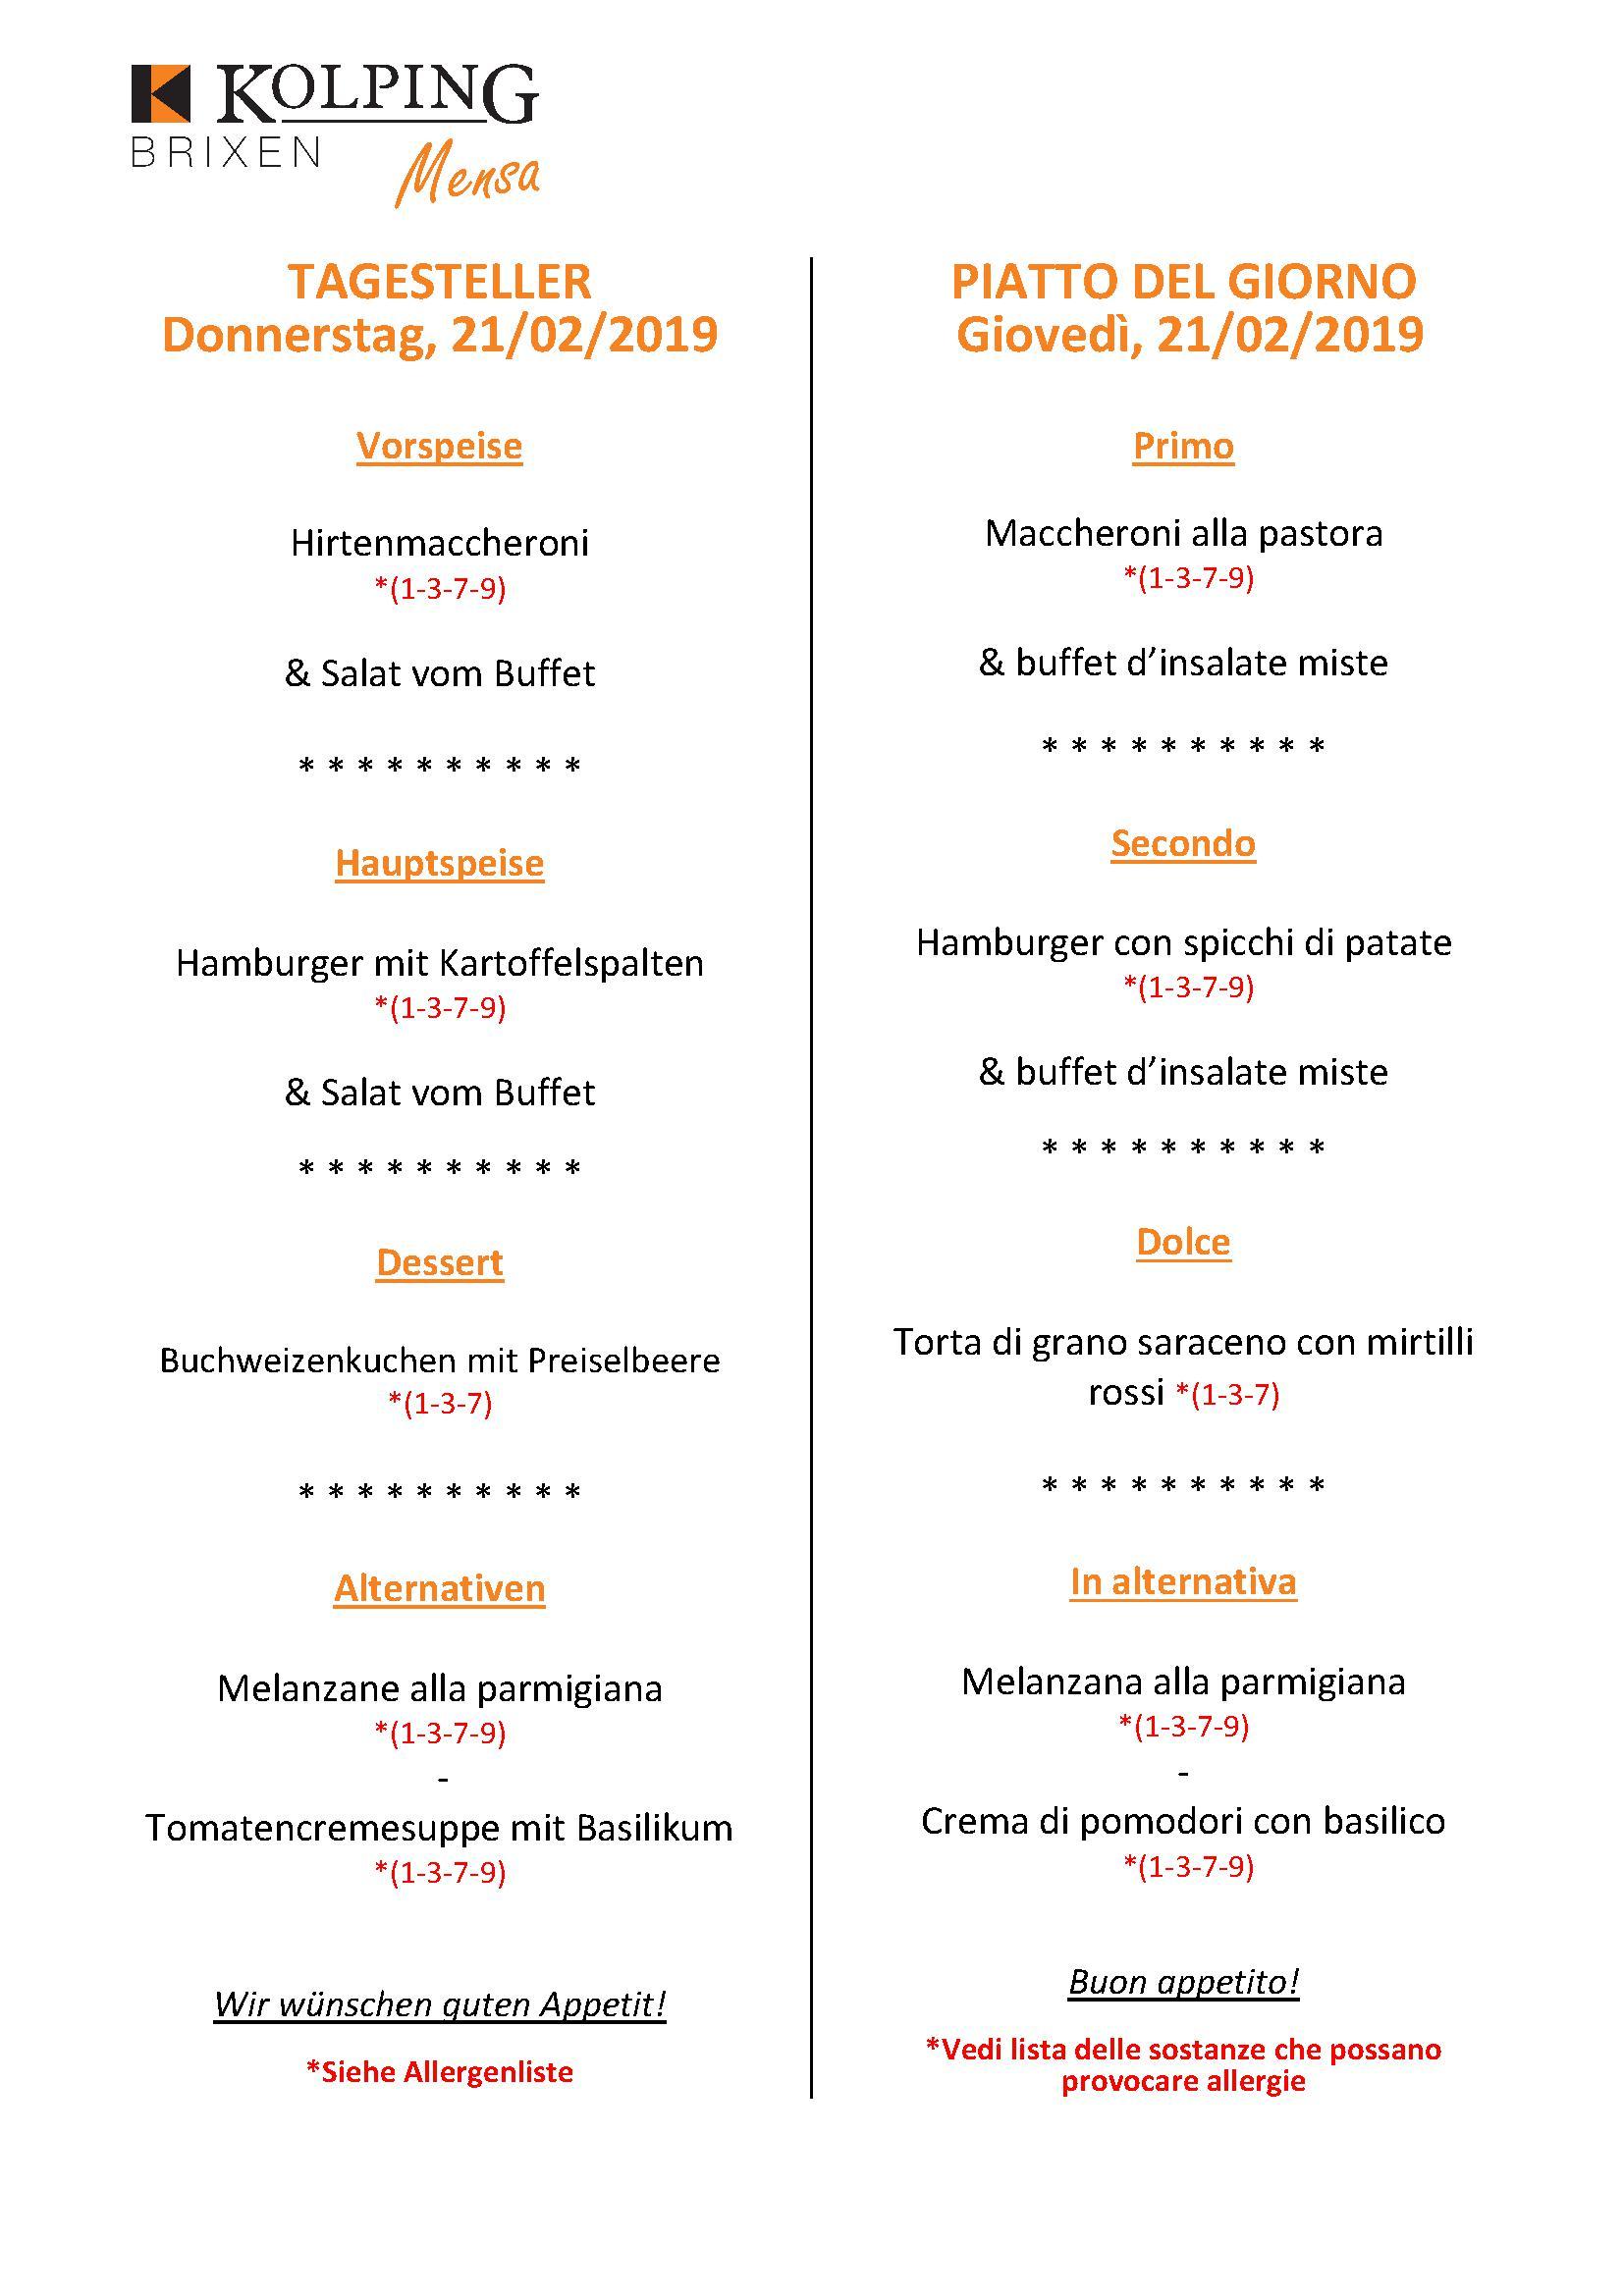 Daily menu